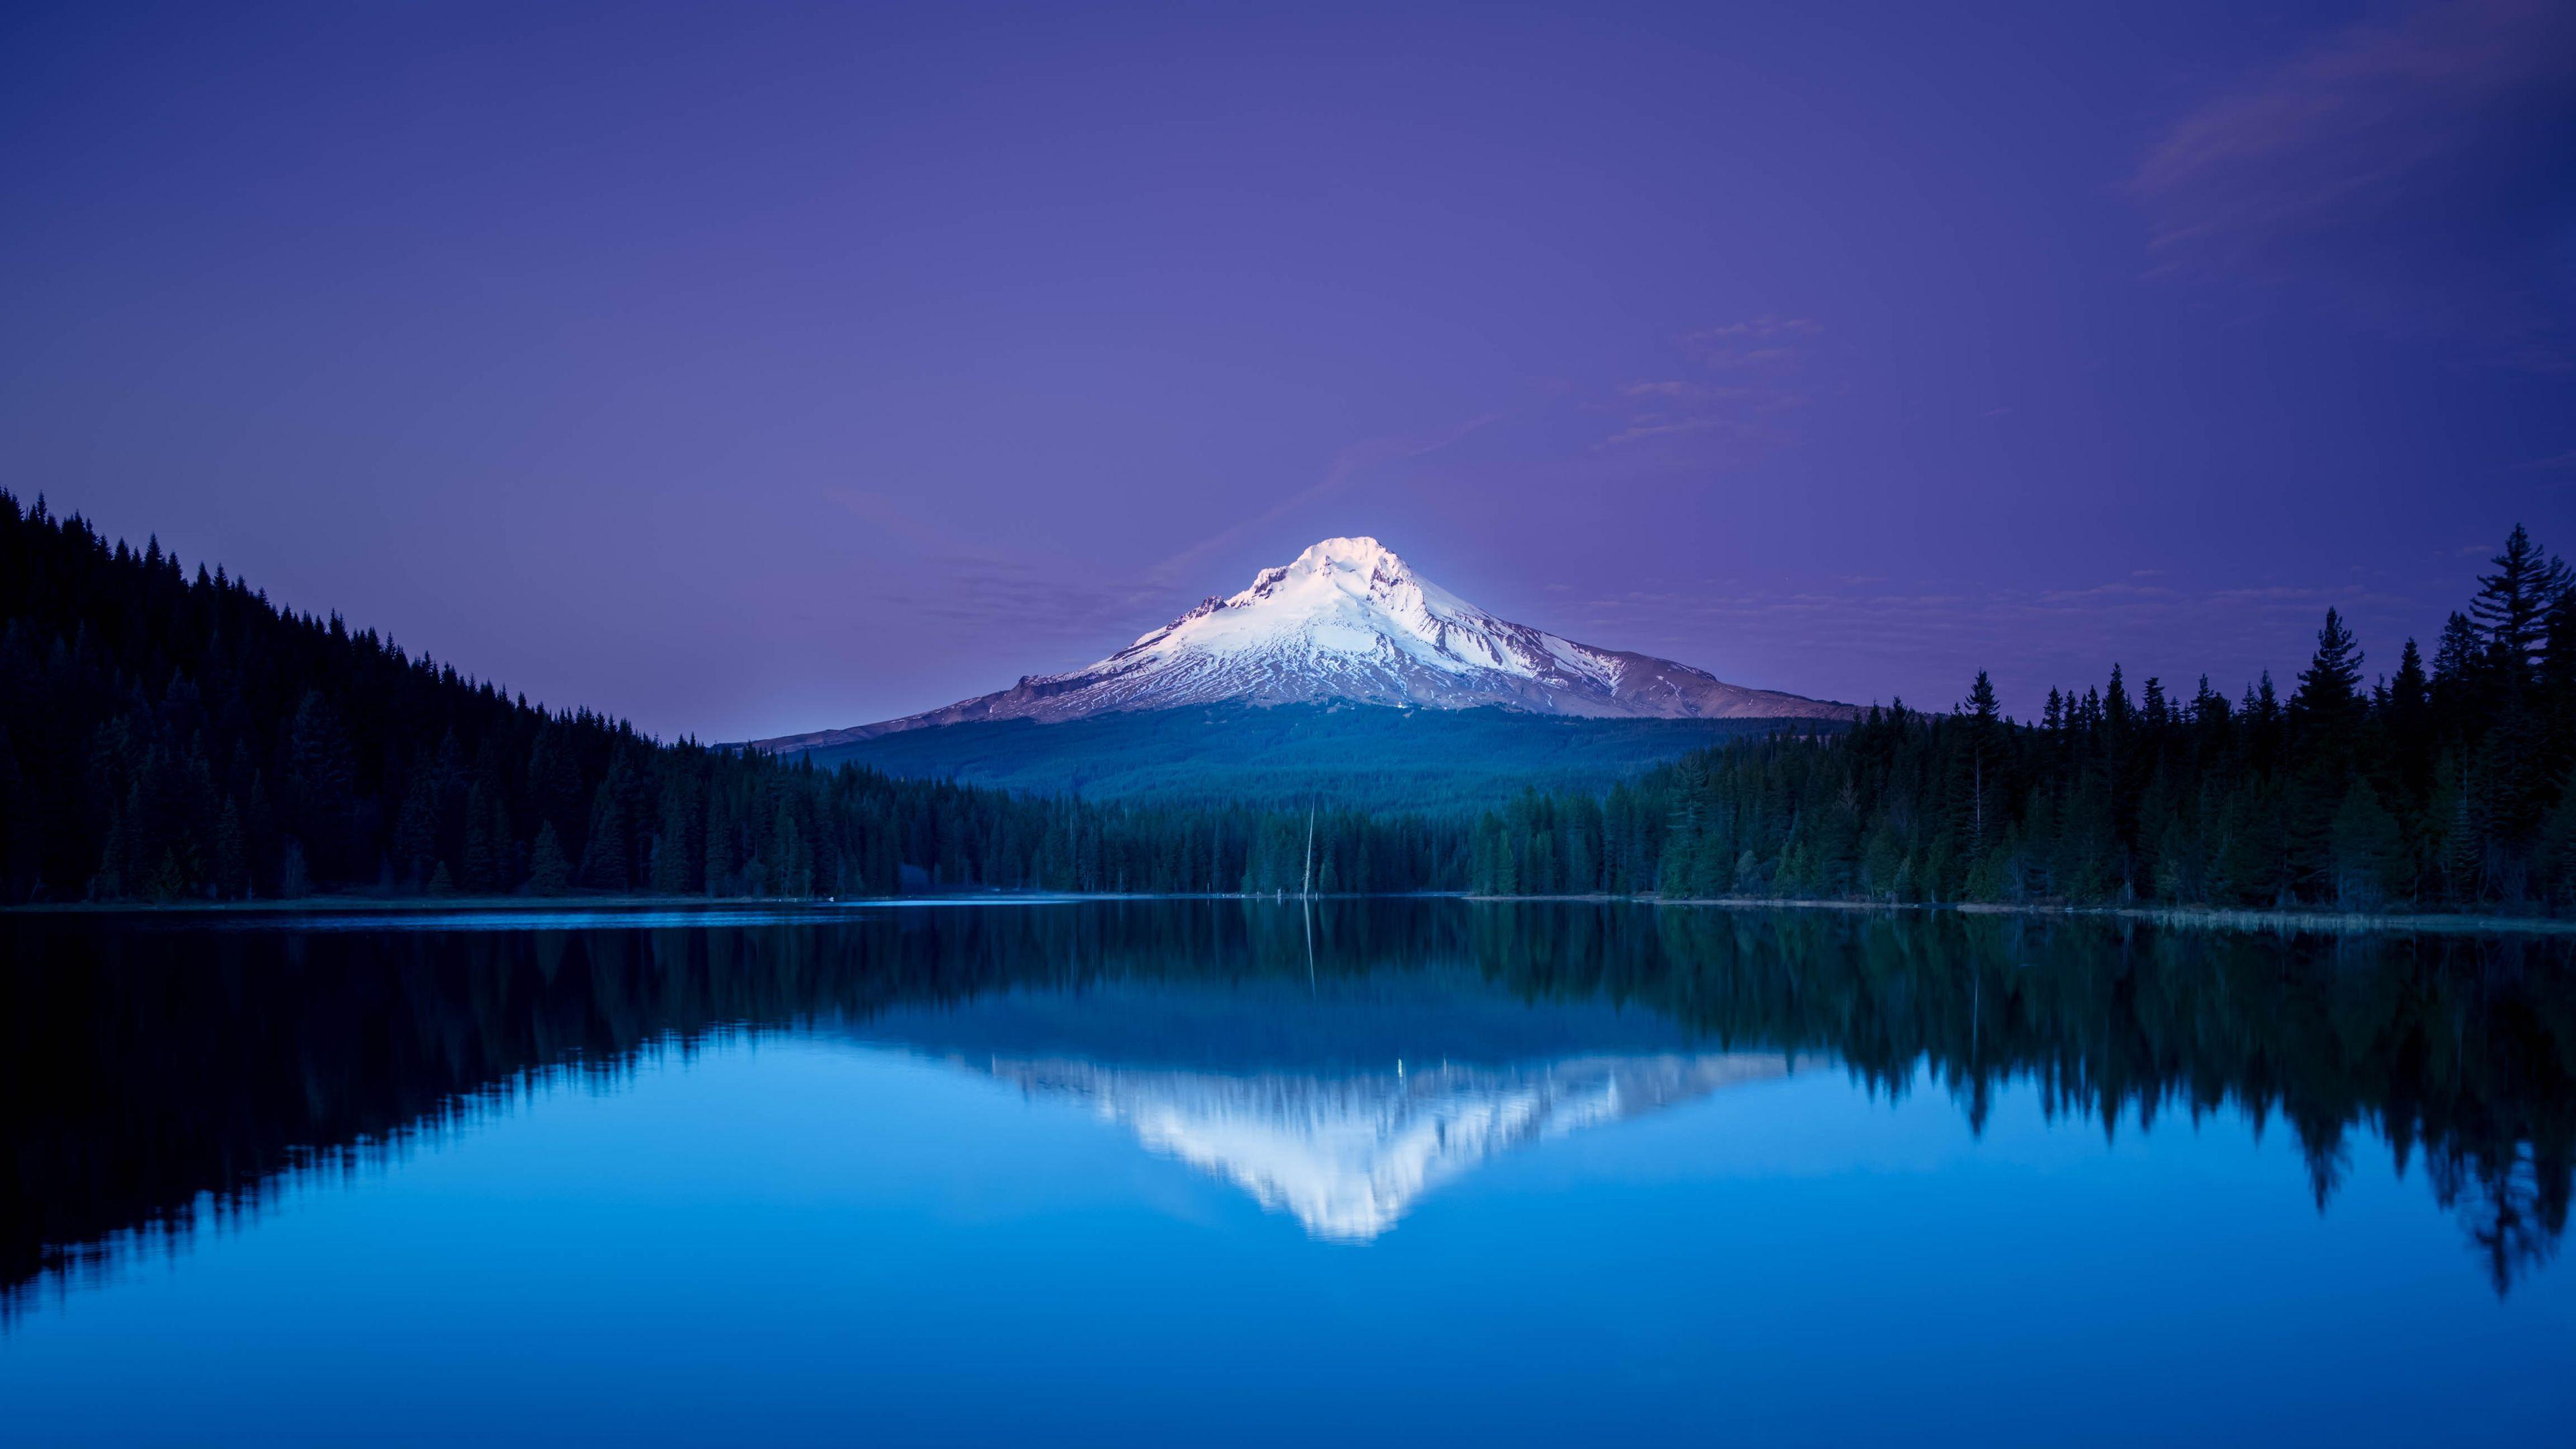 Nice Reflection Nature Wallpaper Mountain Wallpaper Trillium Lake